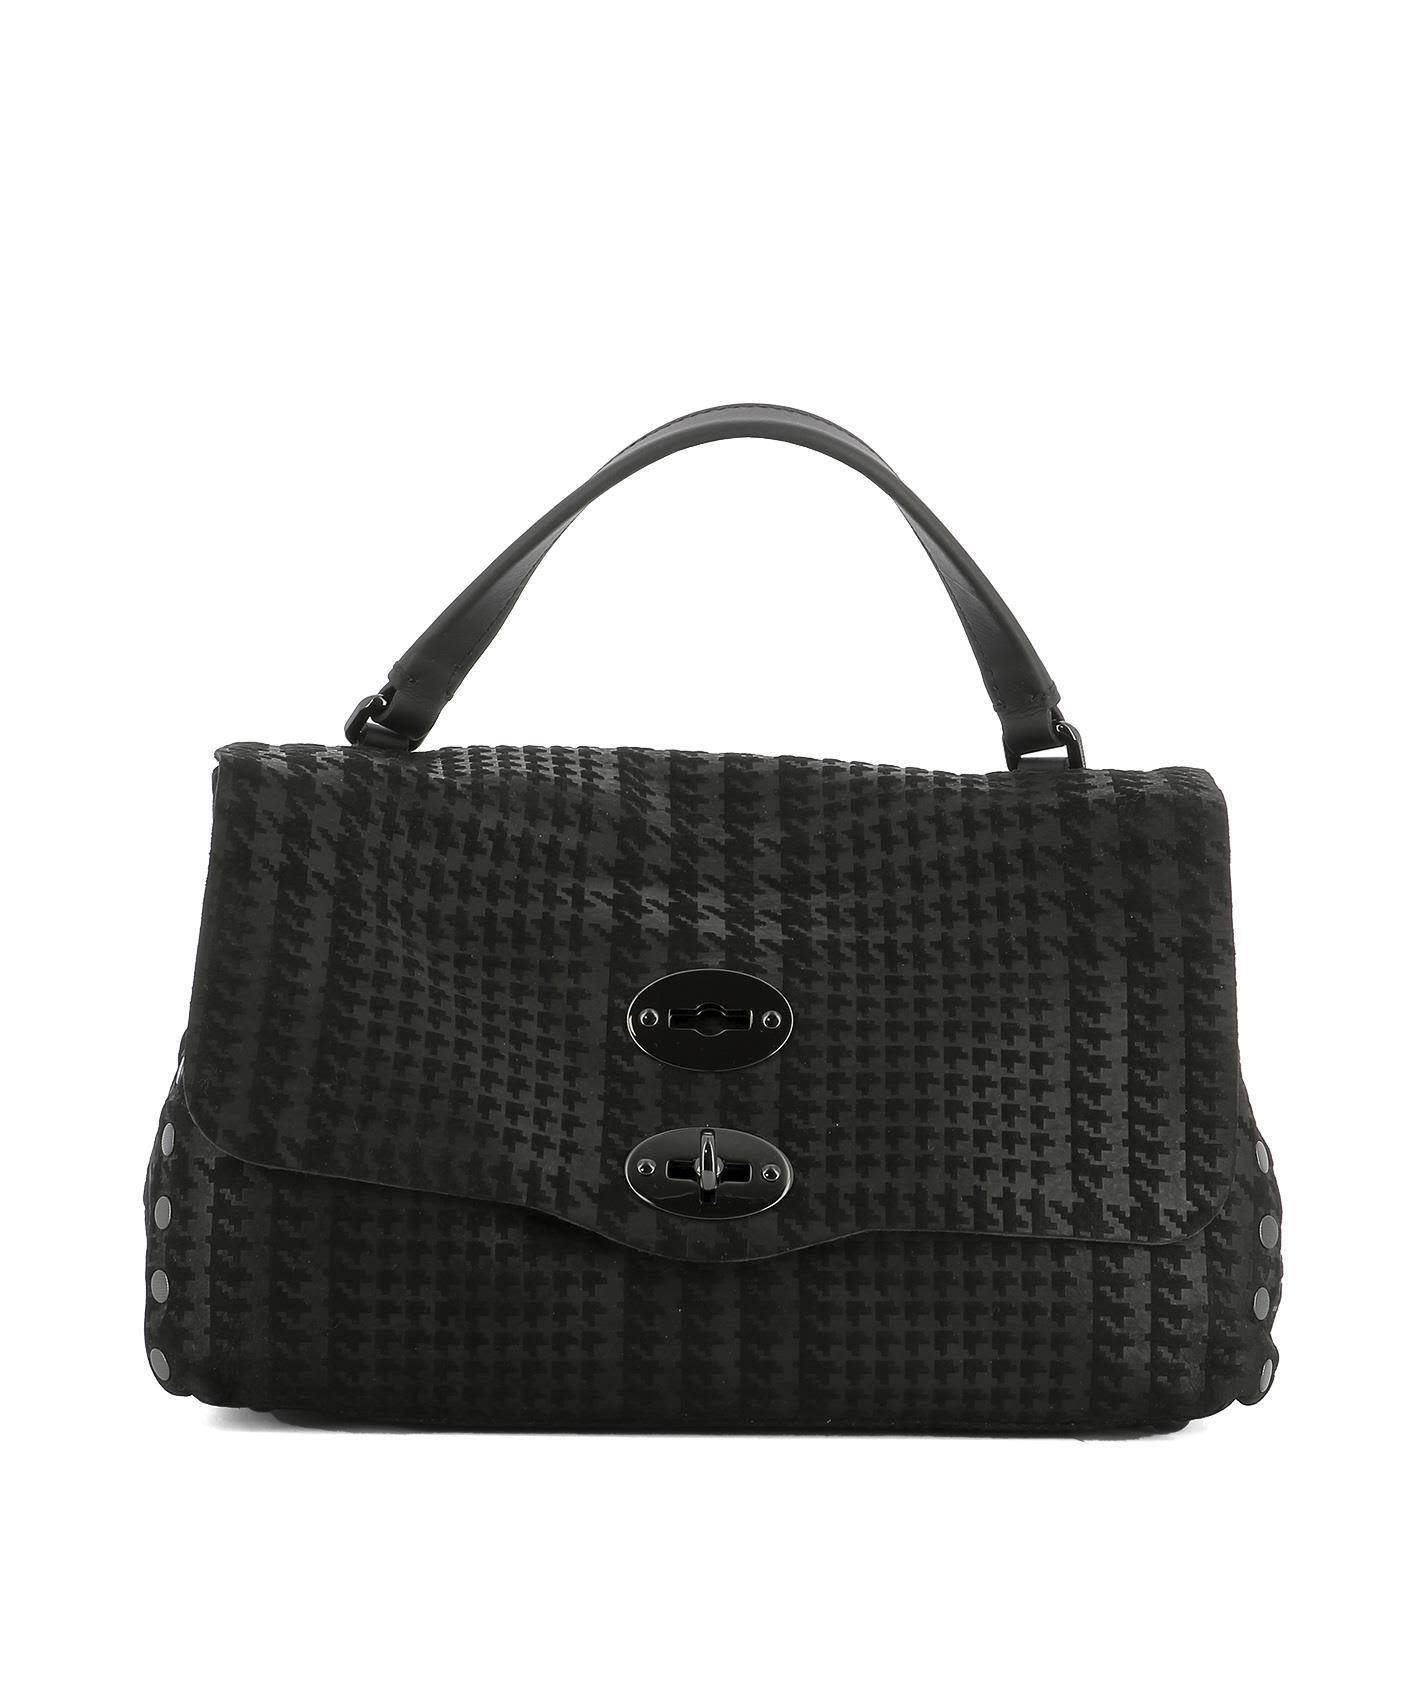 Zanellato Black Suede Handle Bag